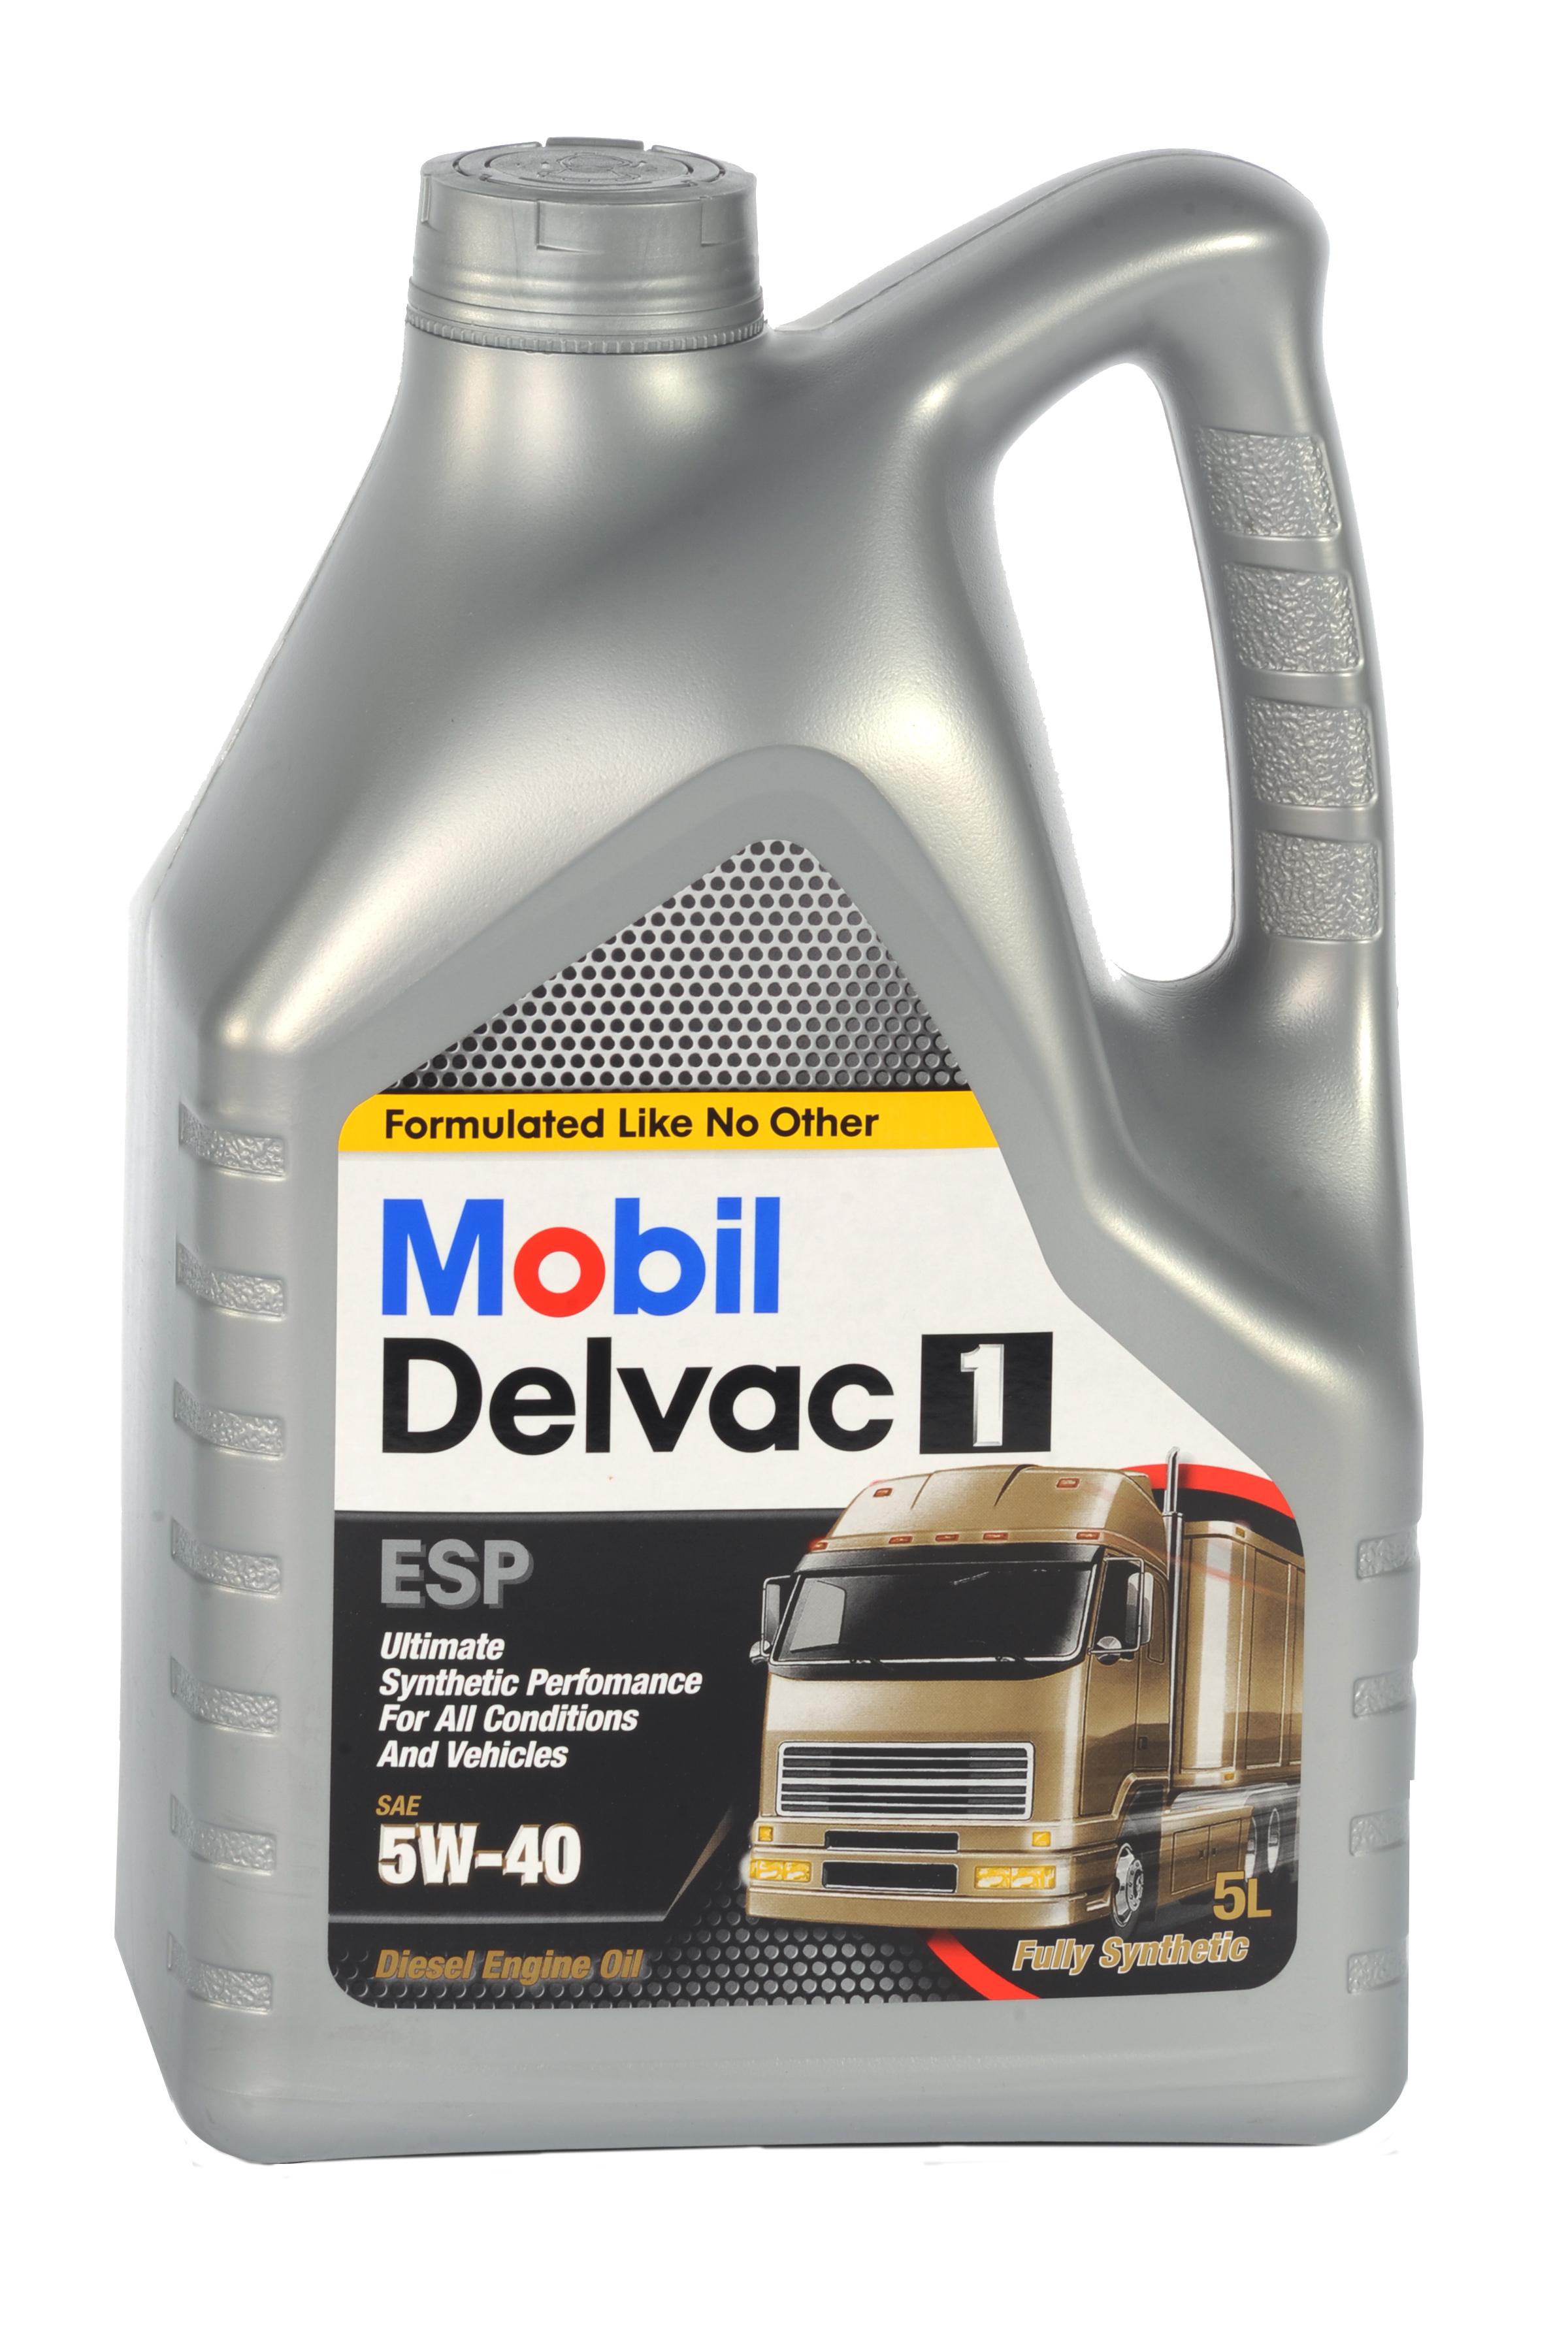 MOBIL OIL DISTRIBUTORS